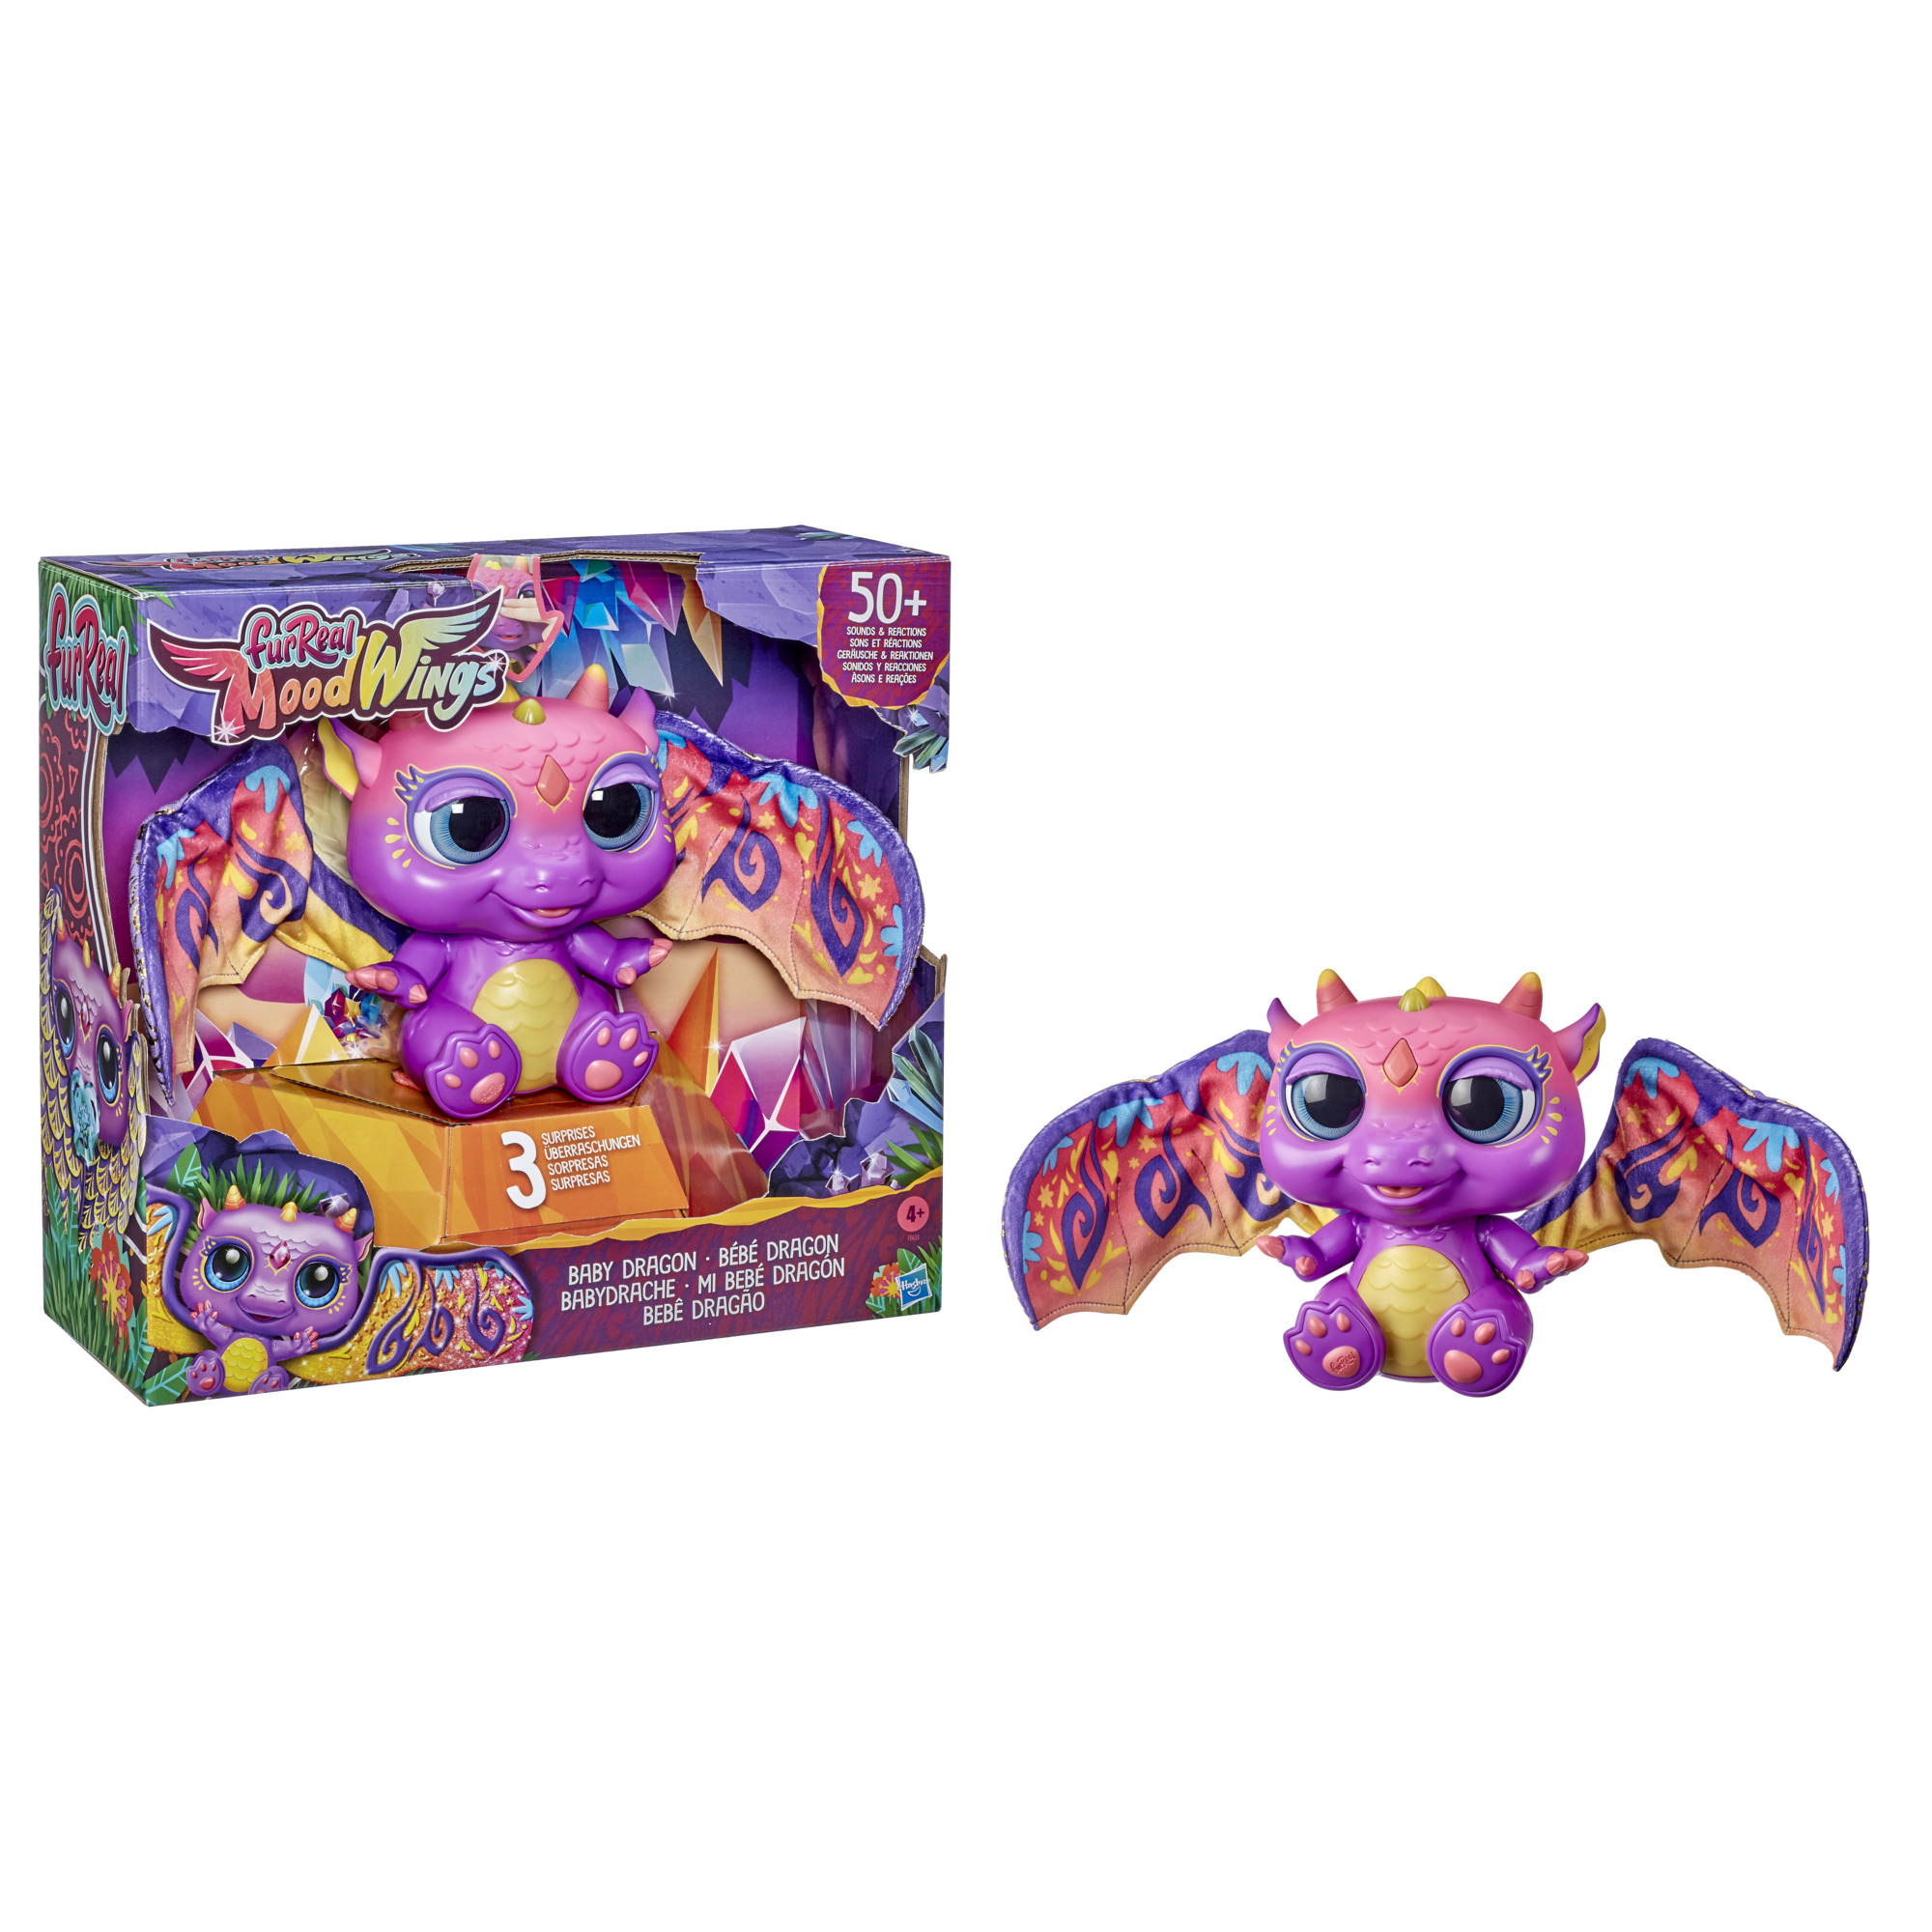 furReal Moodwings Baby Dragon Interactive Pet Only $19.41 (Reg $38.82) + Free Store Pickup at Walmart!